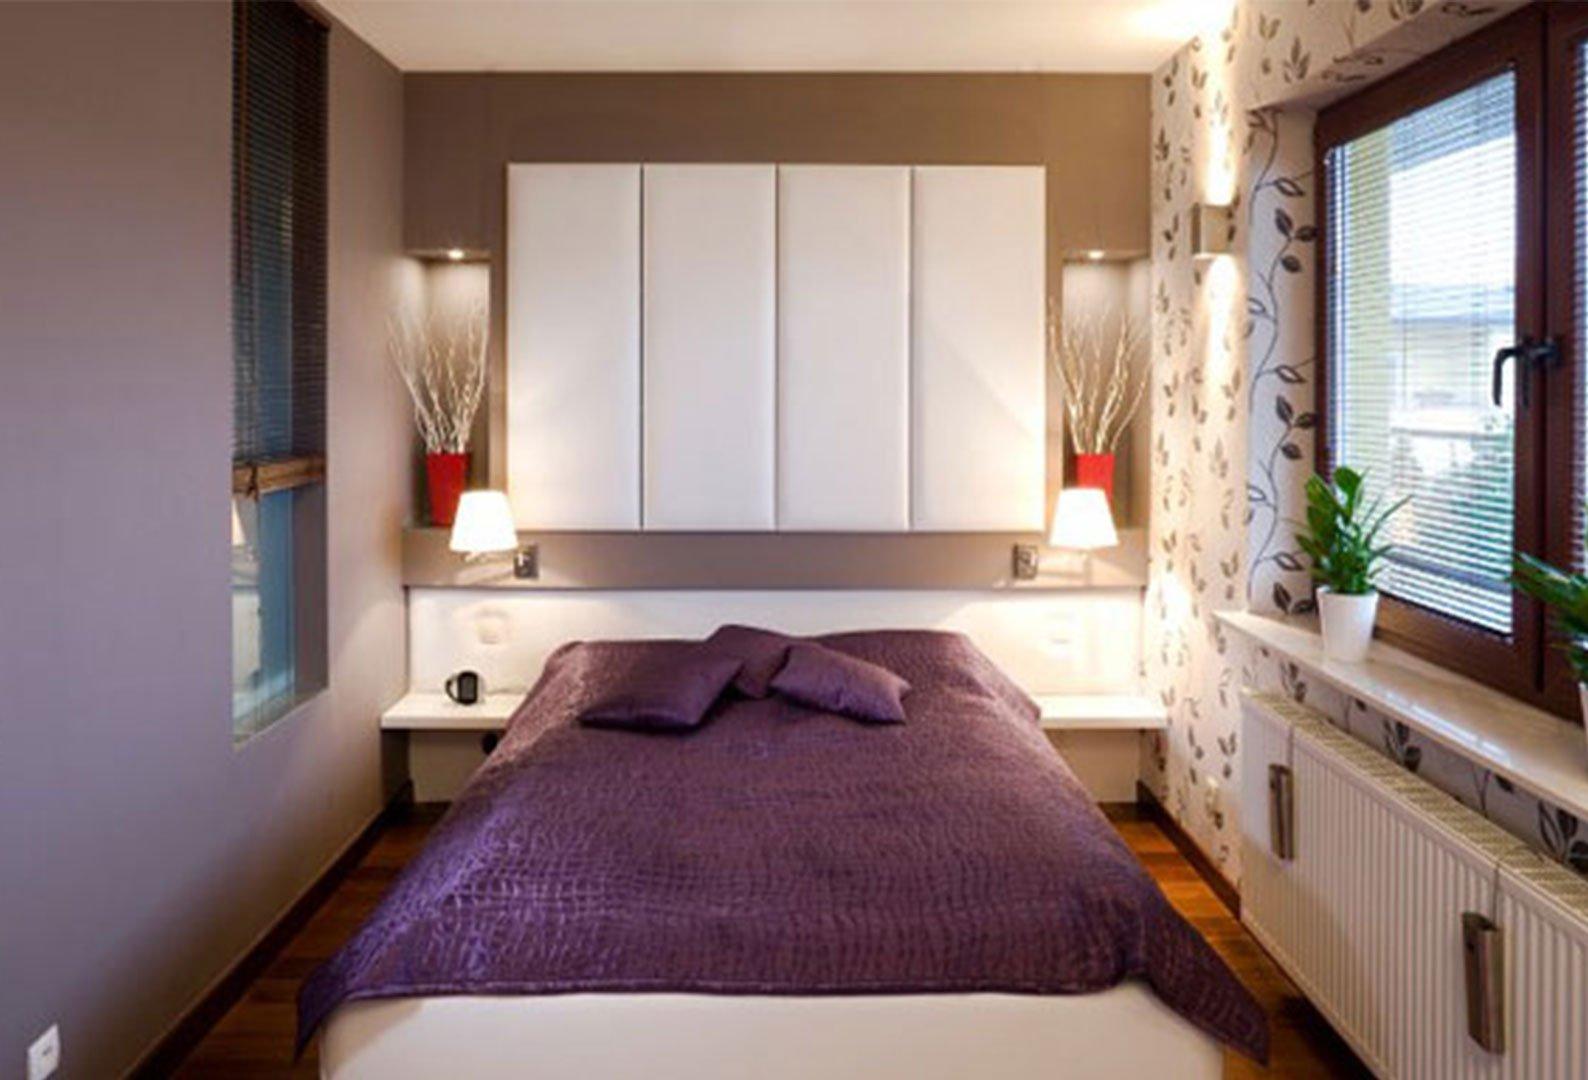 спальня 6 кв м идеи интерьер